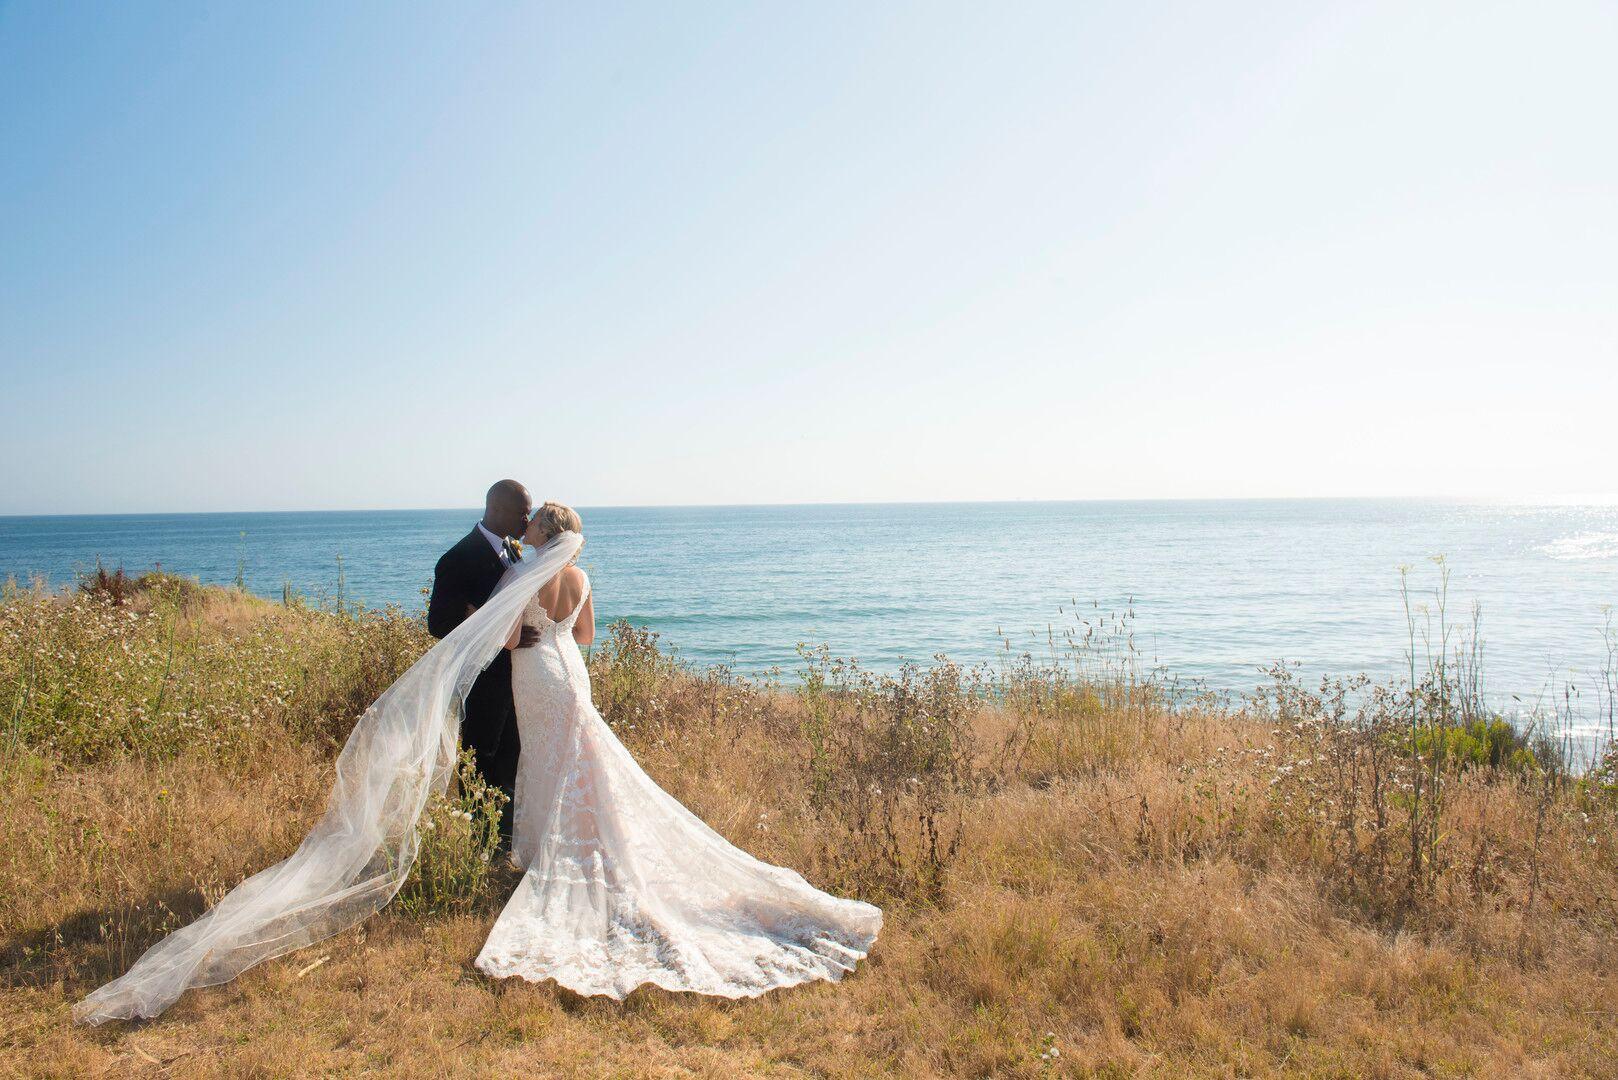 www.santabarbarawedding.com | Venue: Dos Pueblos Ranch | Photographer: ByCherry Photography | Event Designer: Elan Event Rentals | Bride and Groom Kiss